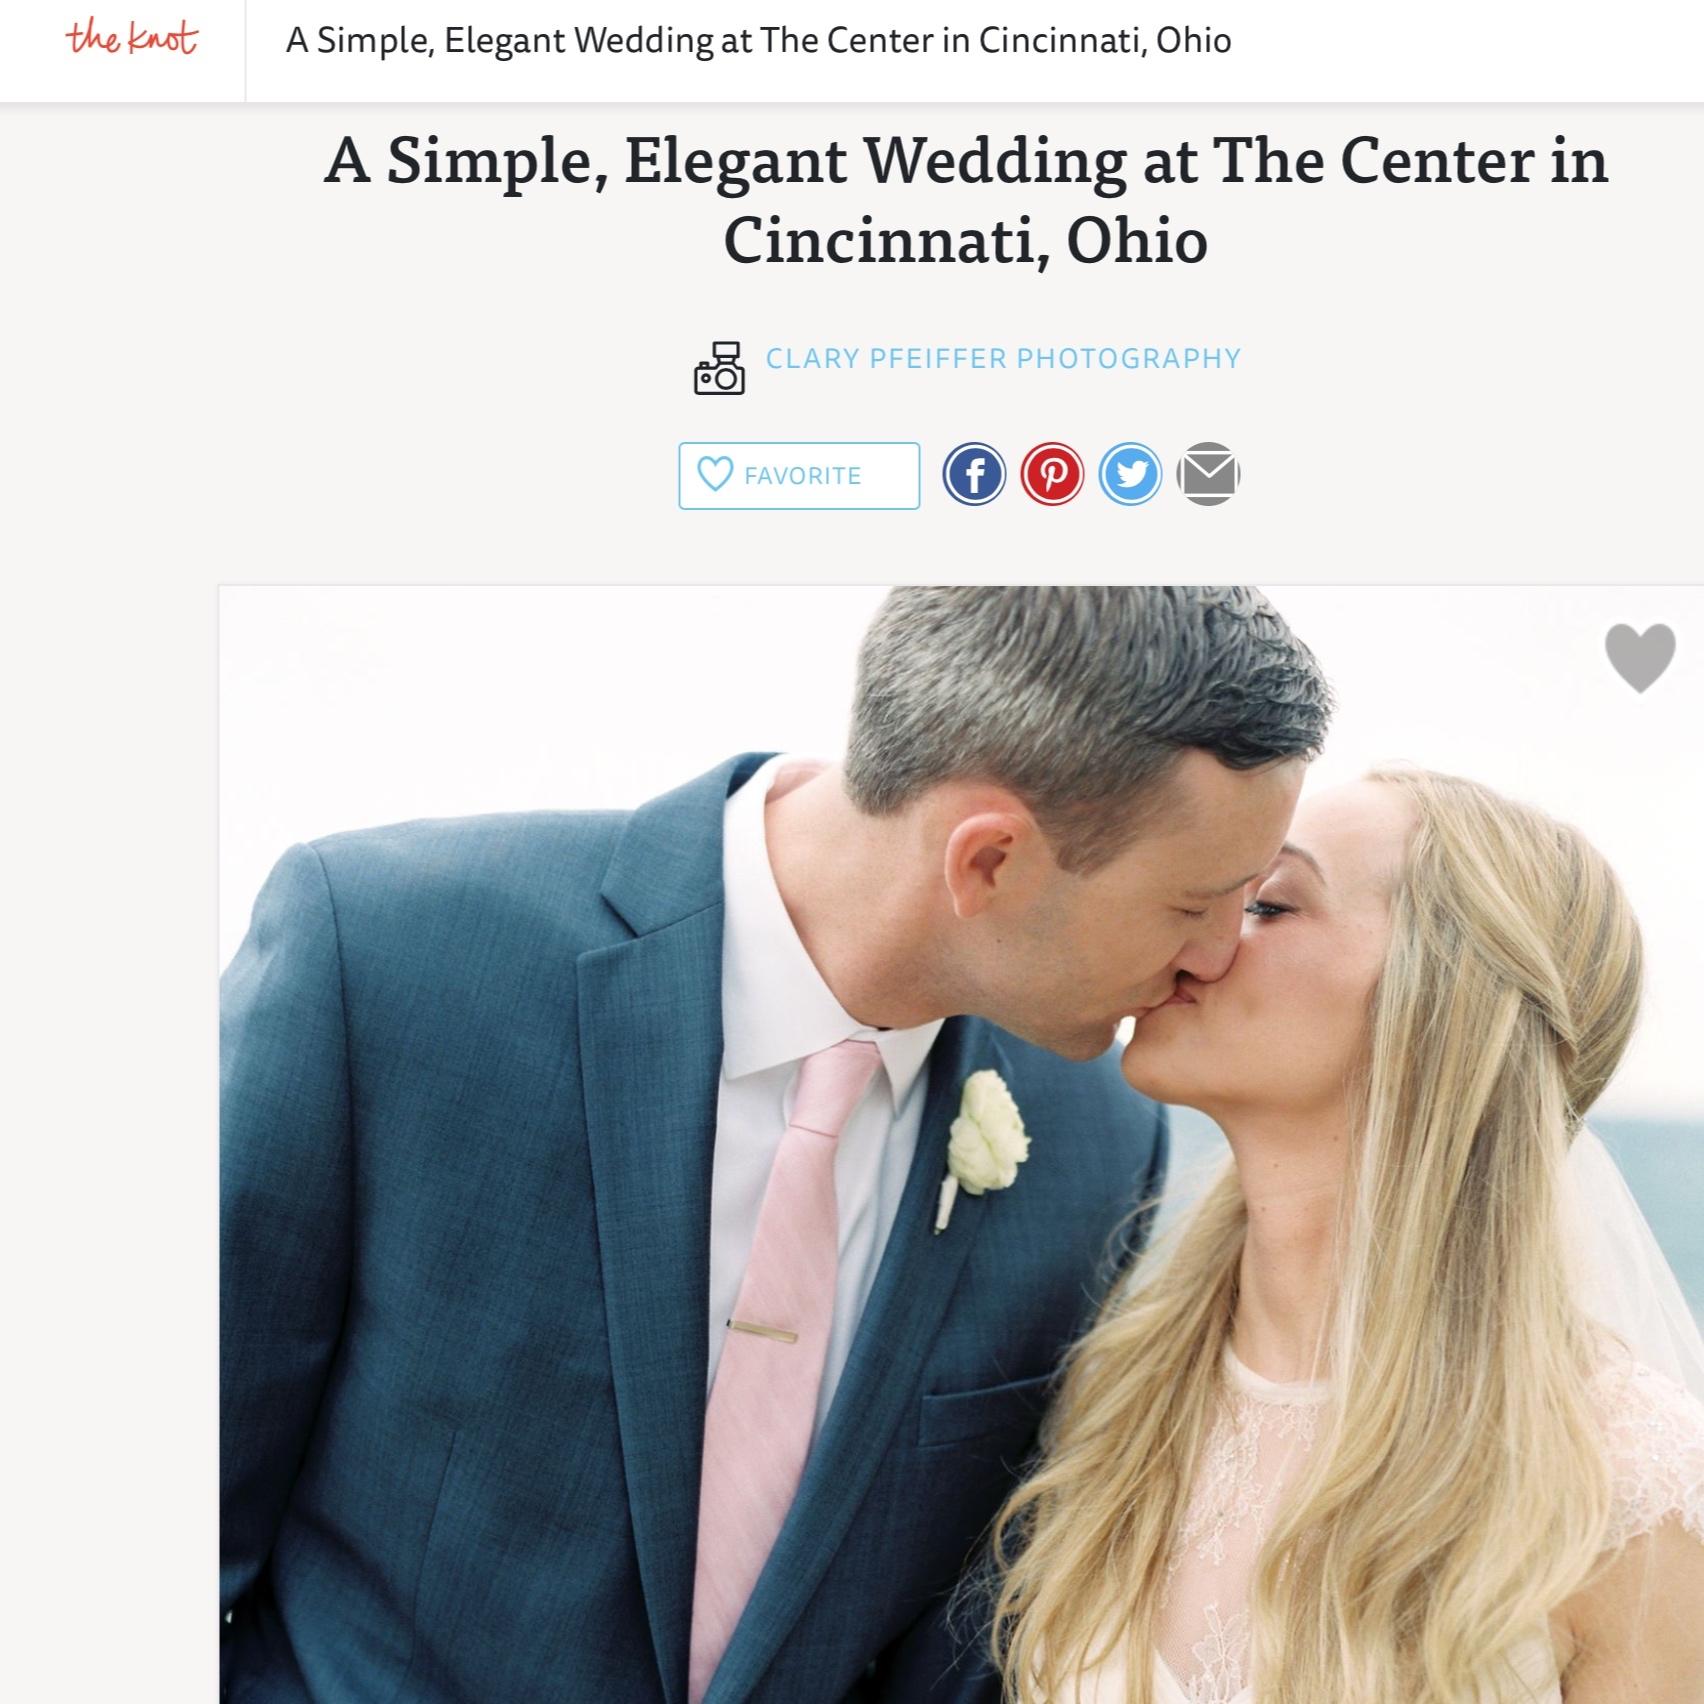 Simple, Elegant Wedding at The Center